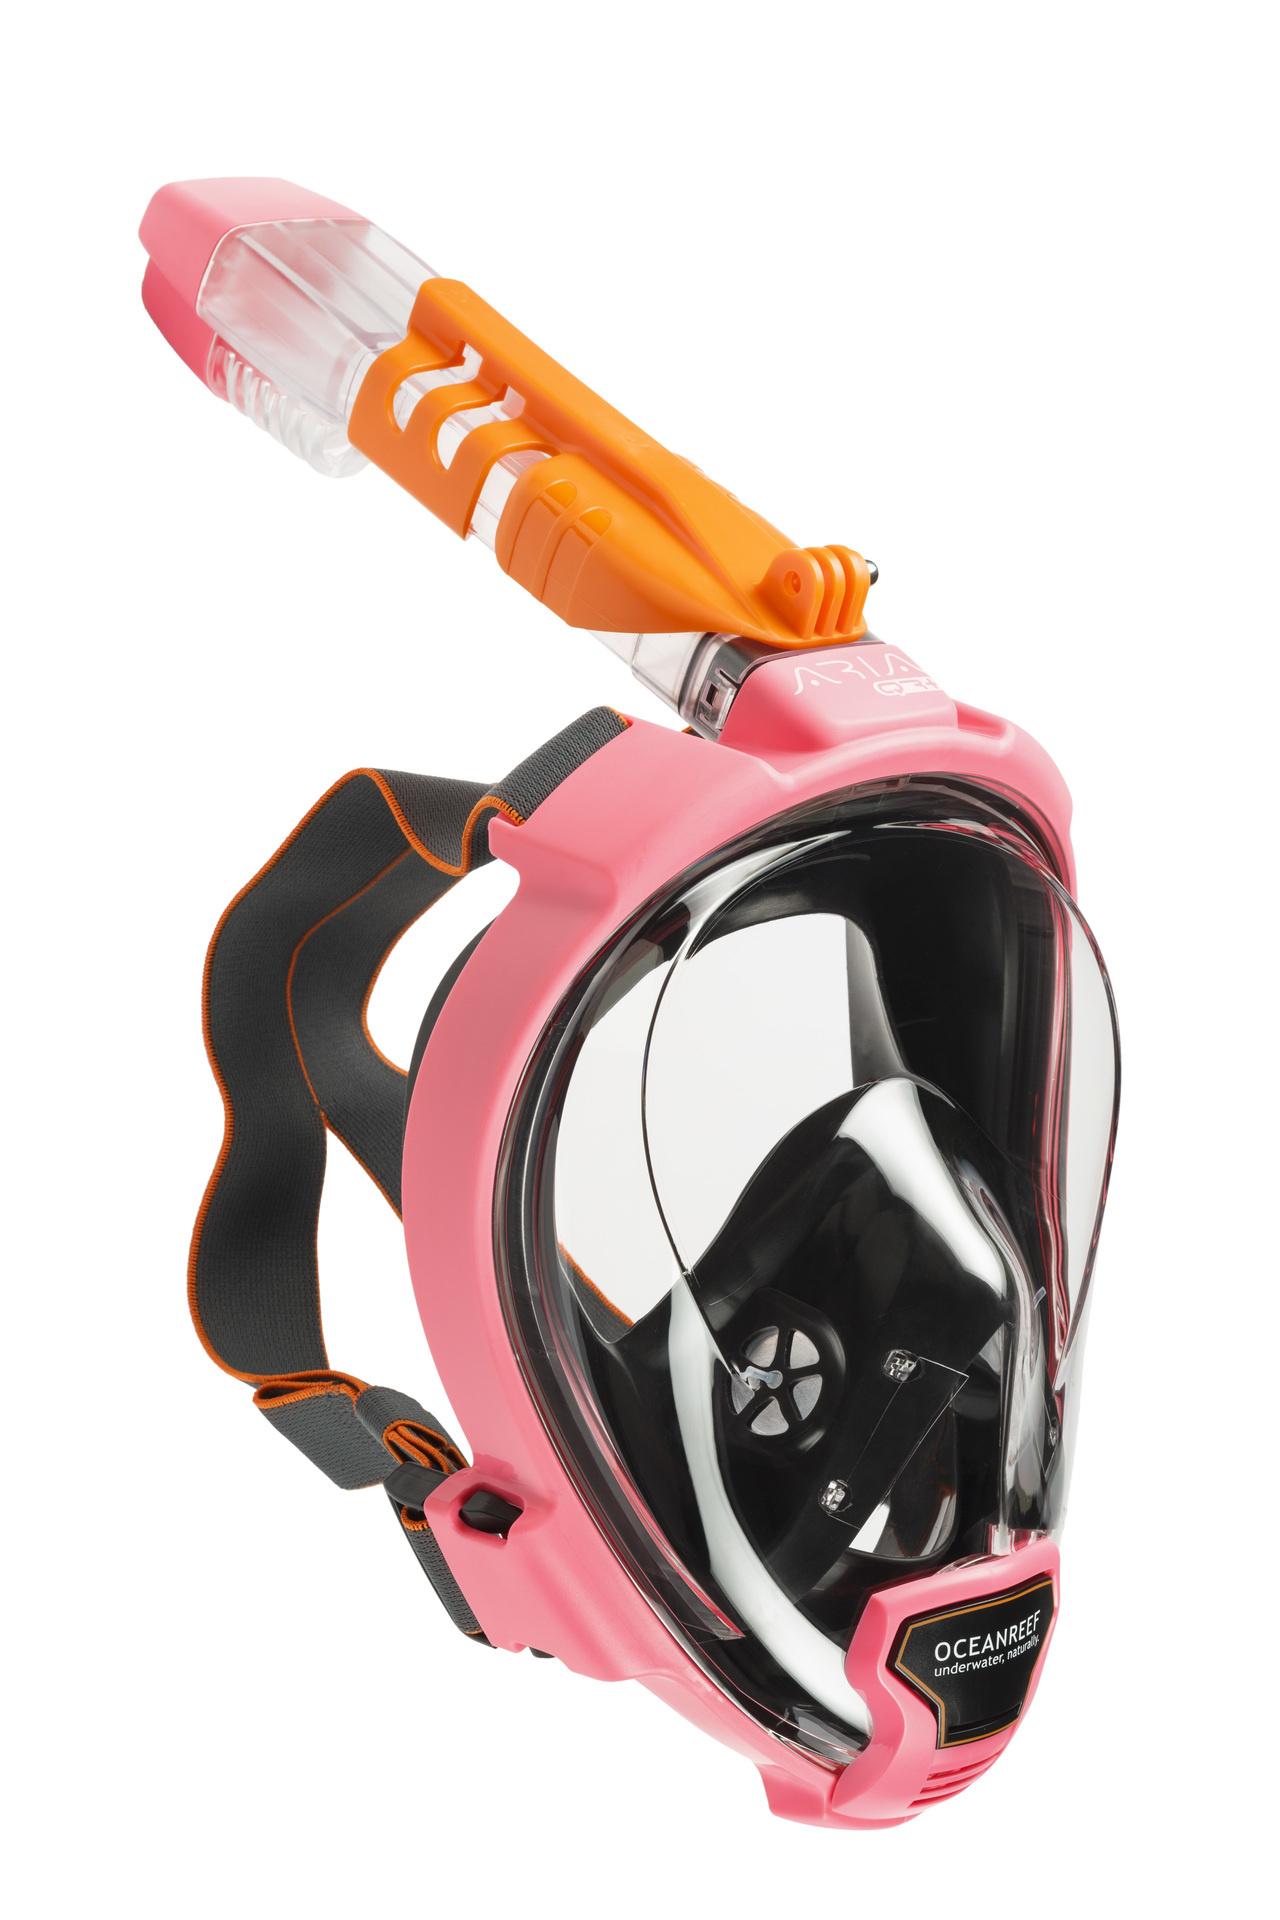 Ocean Reef Aria QR+  Snorkelmasker Roze